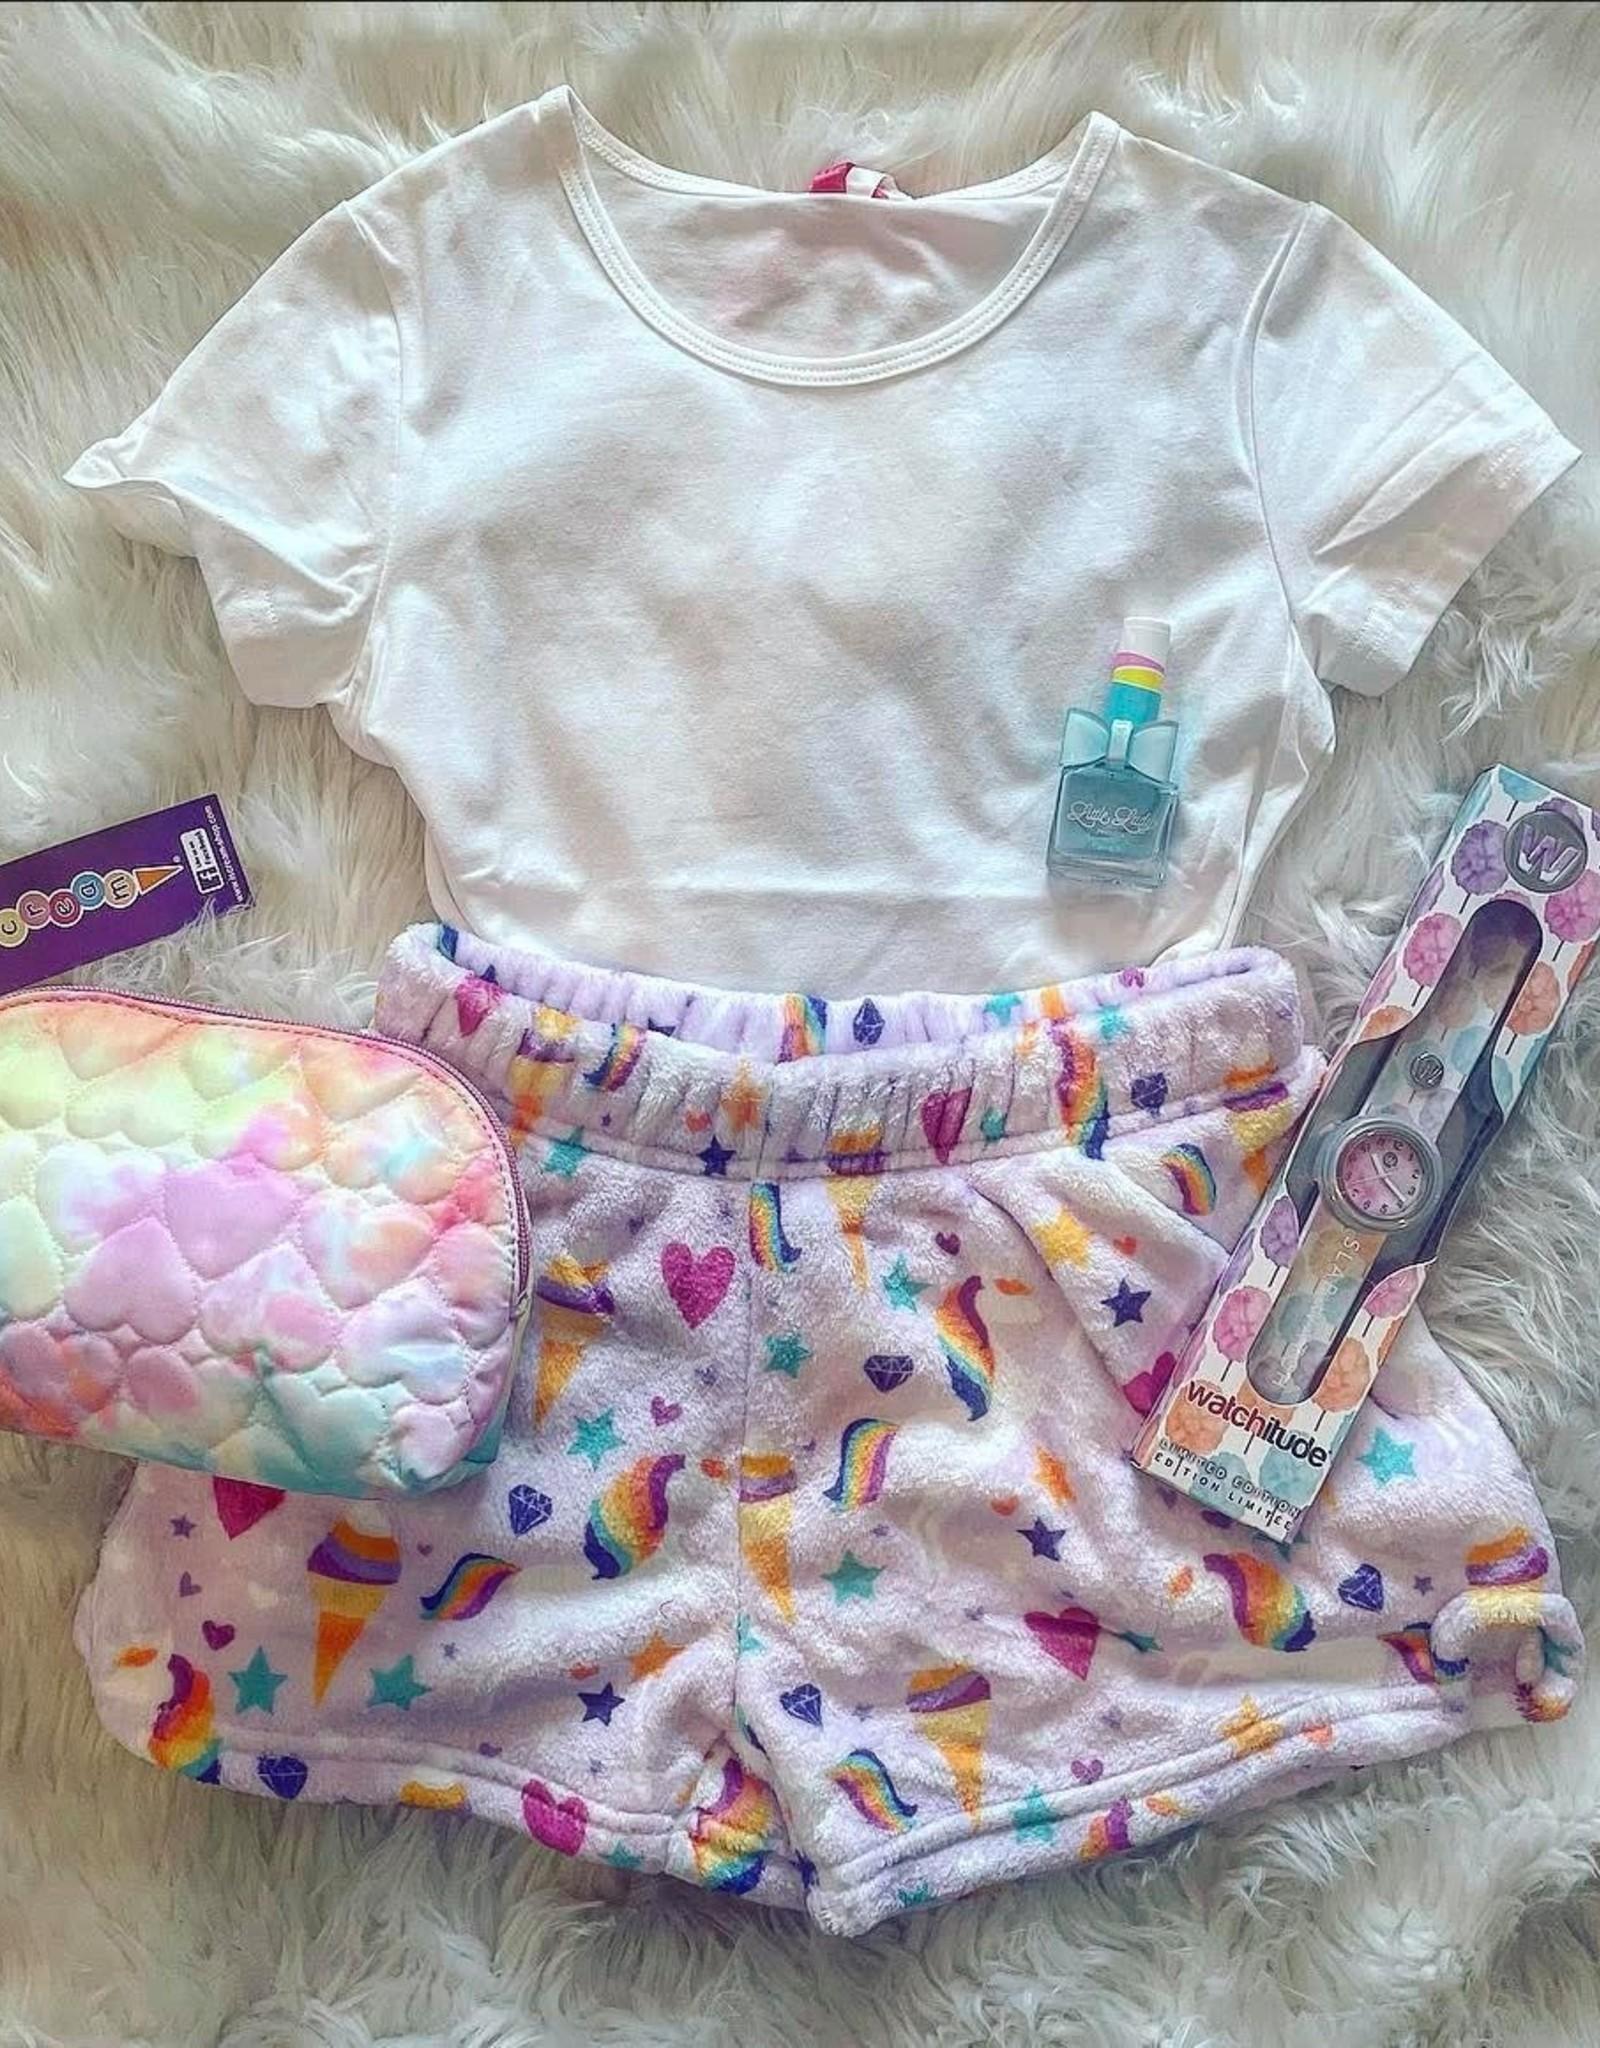 Iscream Magical Unicorn Plush Shorts